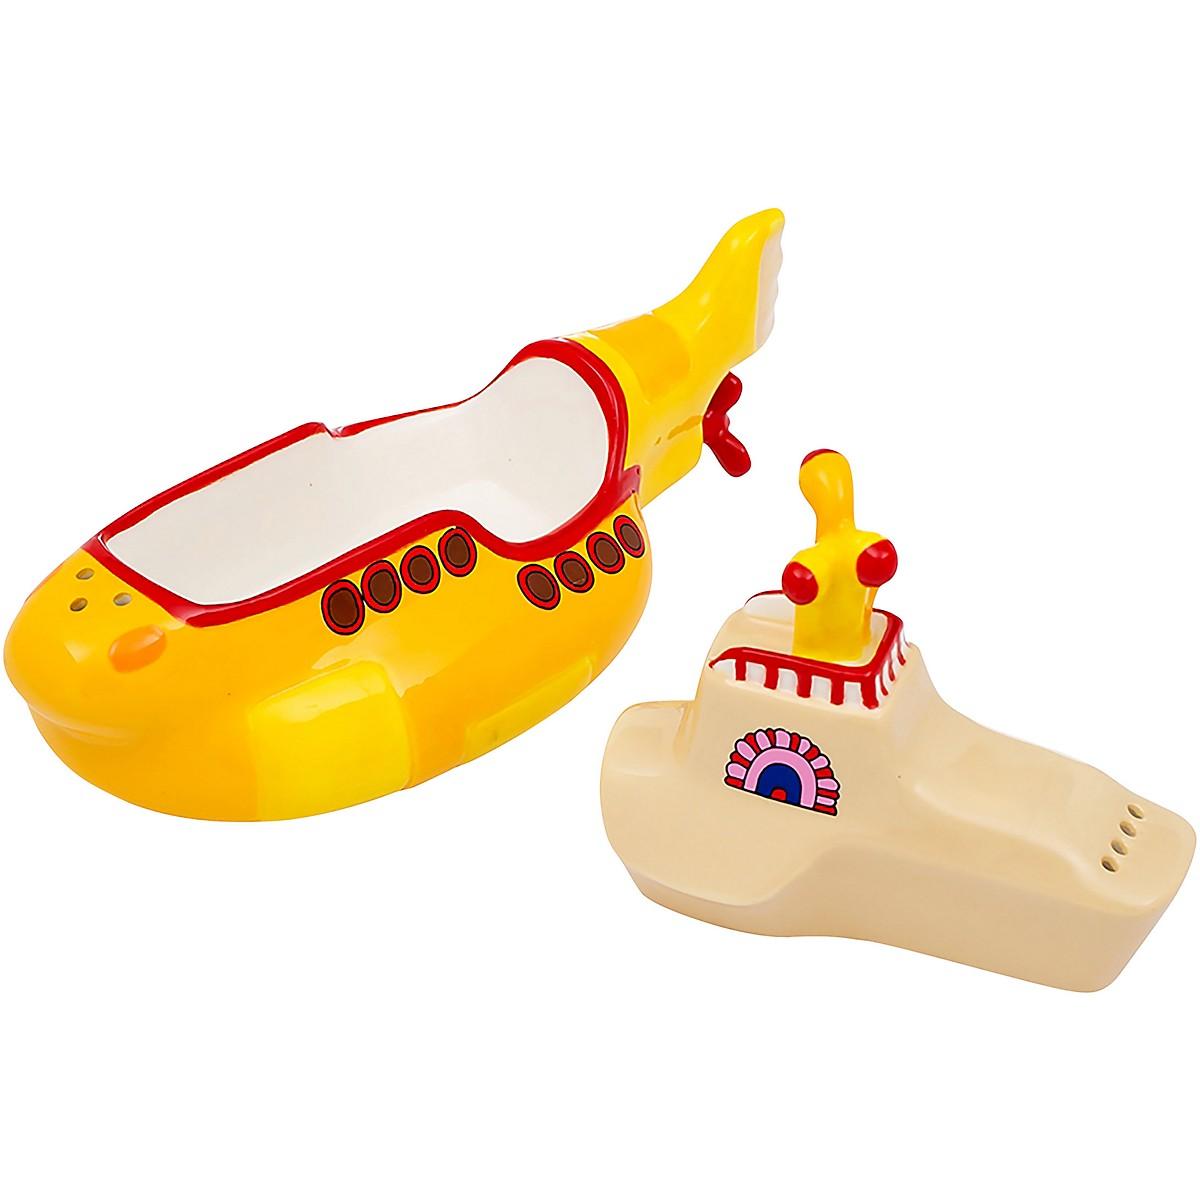 Vandor The Beatles Yellow Submarine Salt & Pepper Set